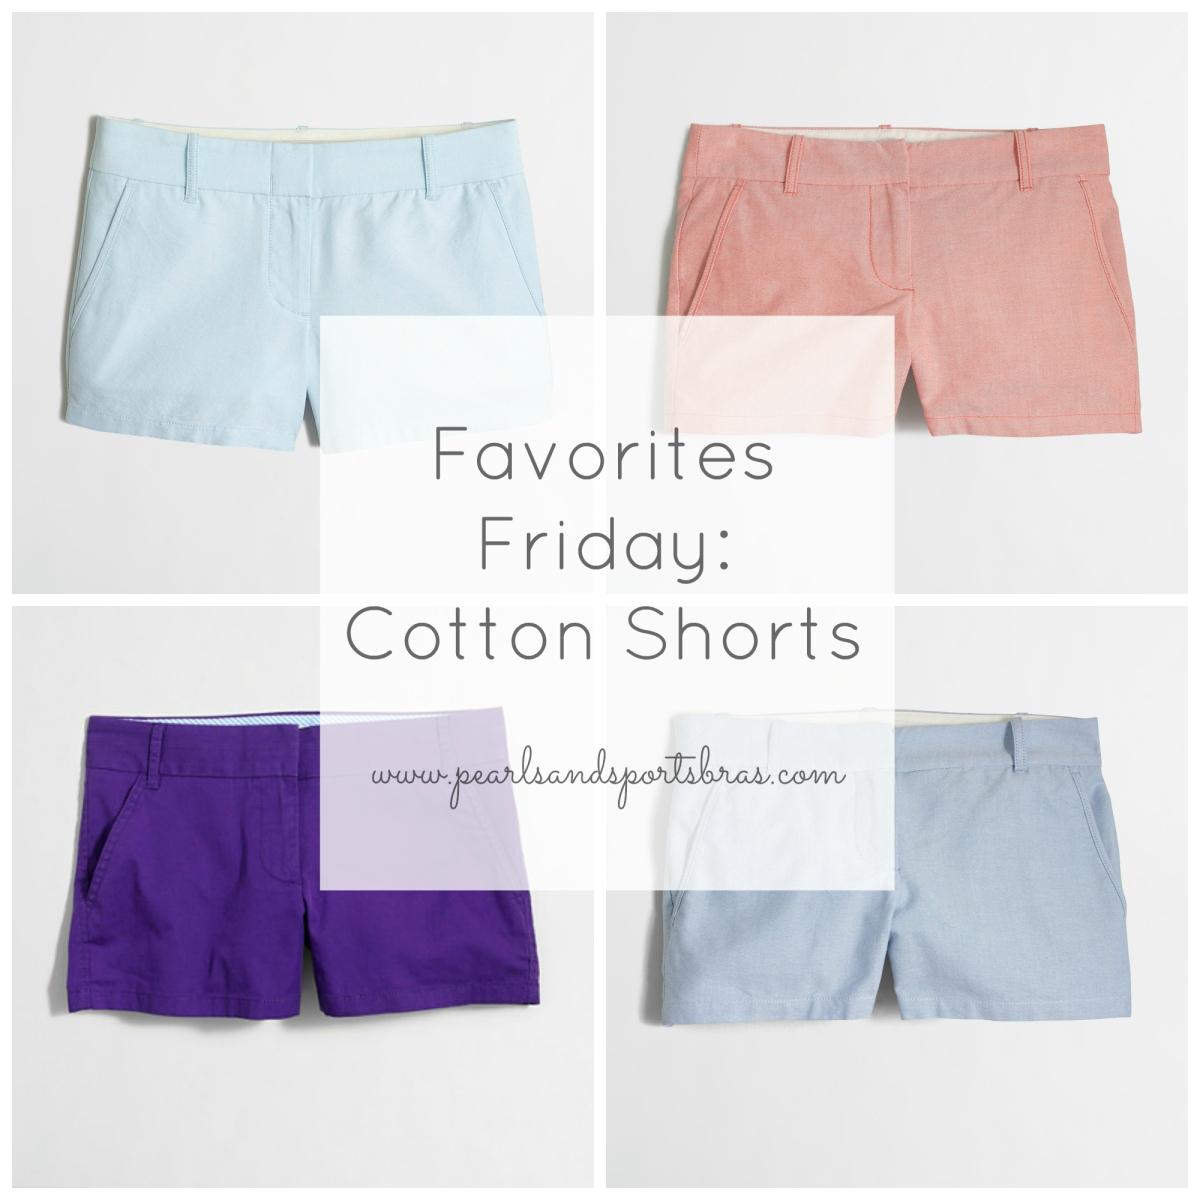 Favorites Friday: The best cotton shorts! |www.pearlsandsportsbras.com|